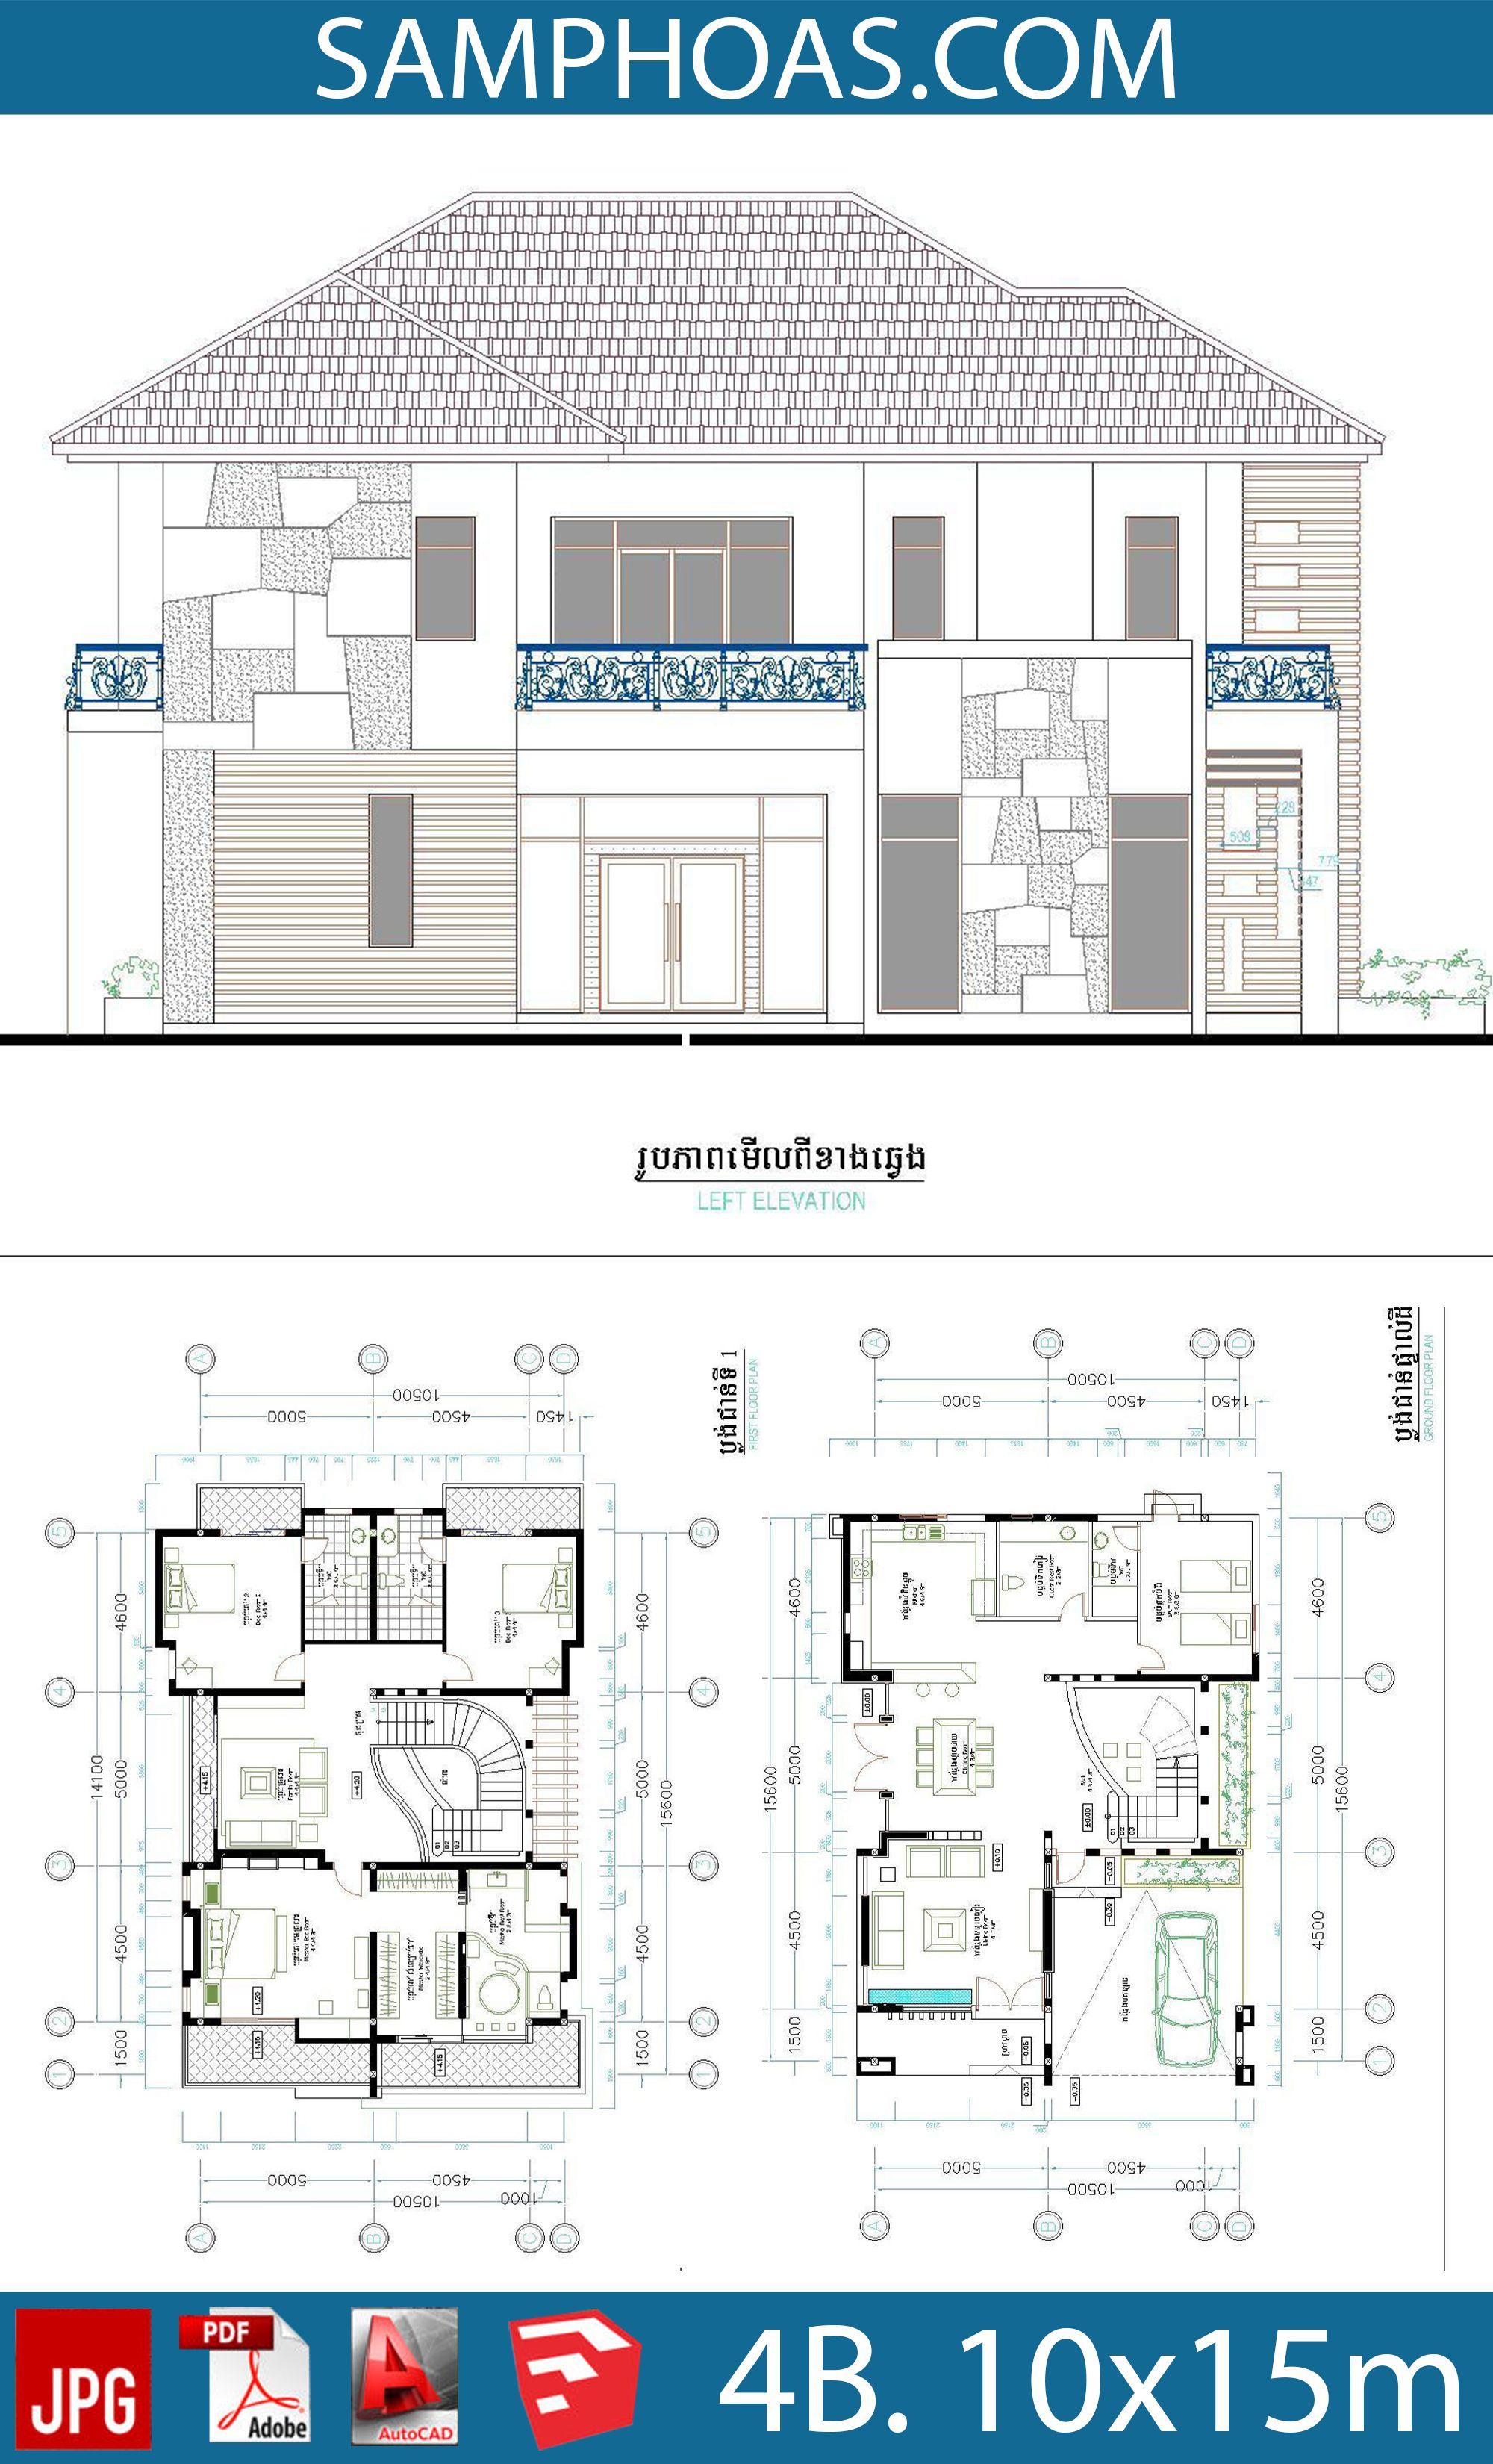 4 Bedroom Home Plan Full Exterior And Interior 10x15 6m Samphoas Plan Unique House Plans Duplex House Design House Plans